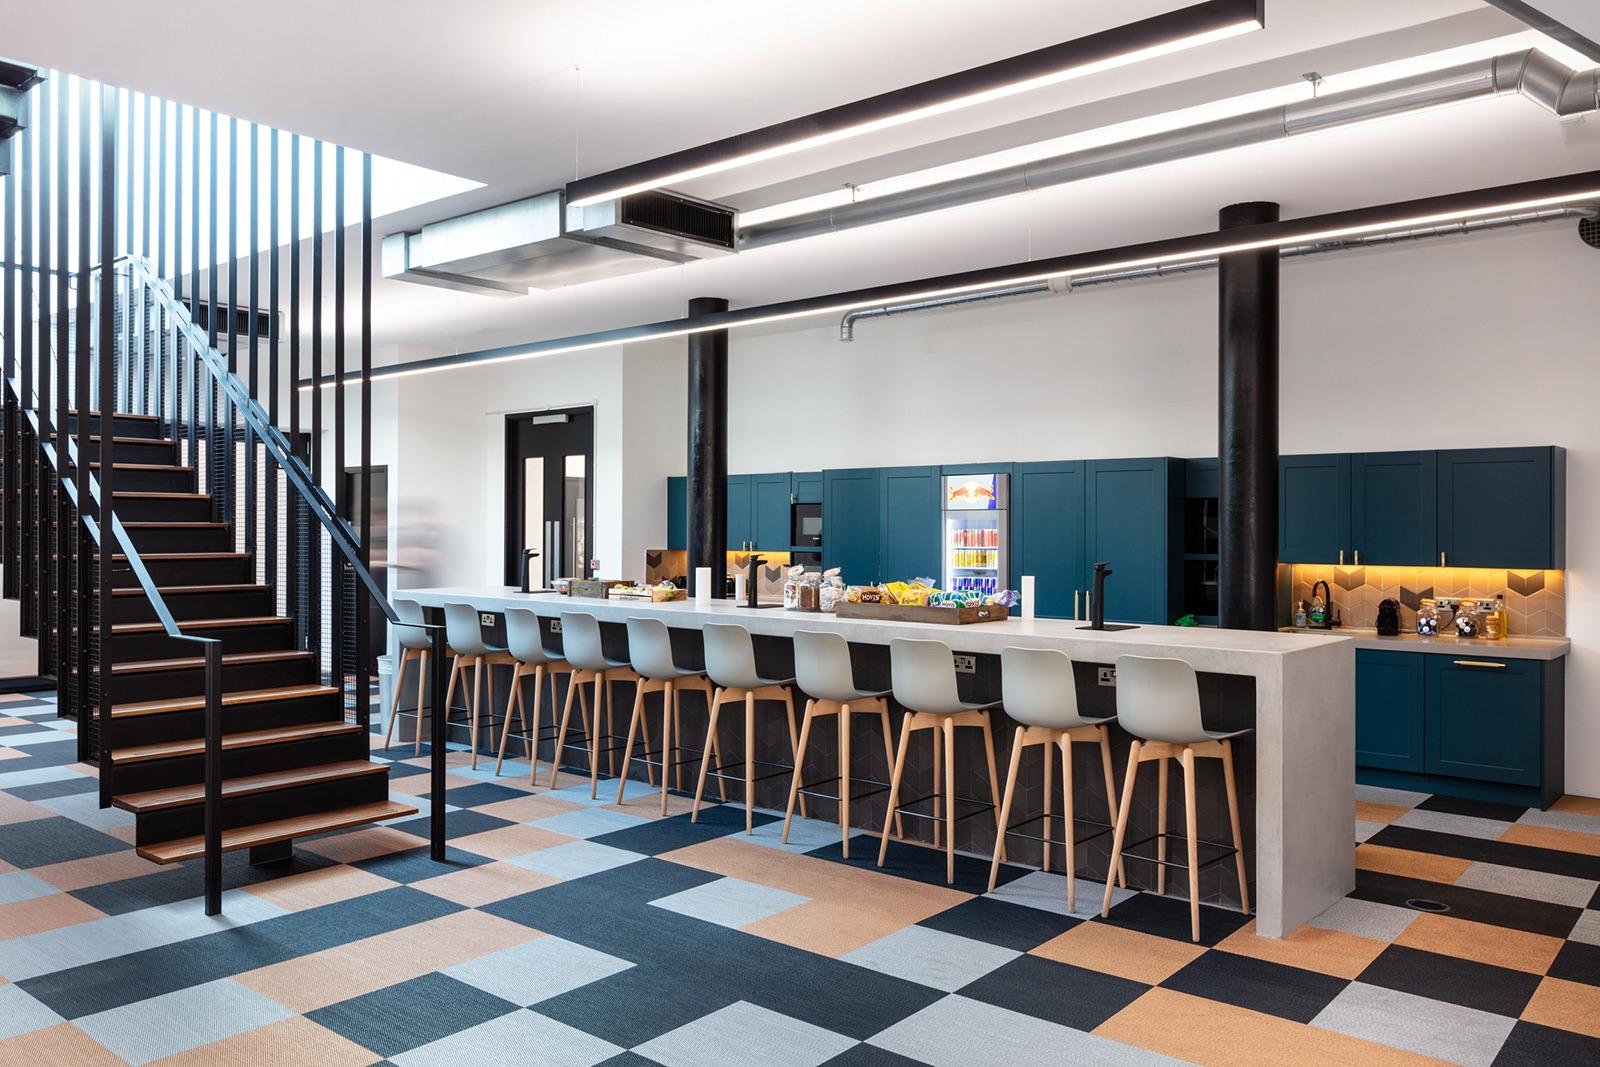 redbull-london-office-5